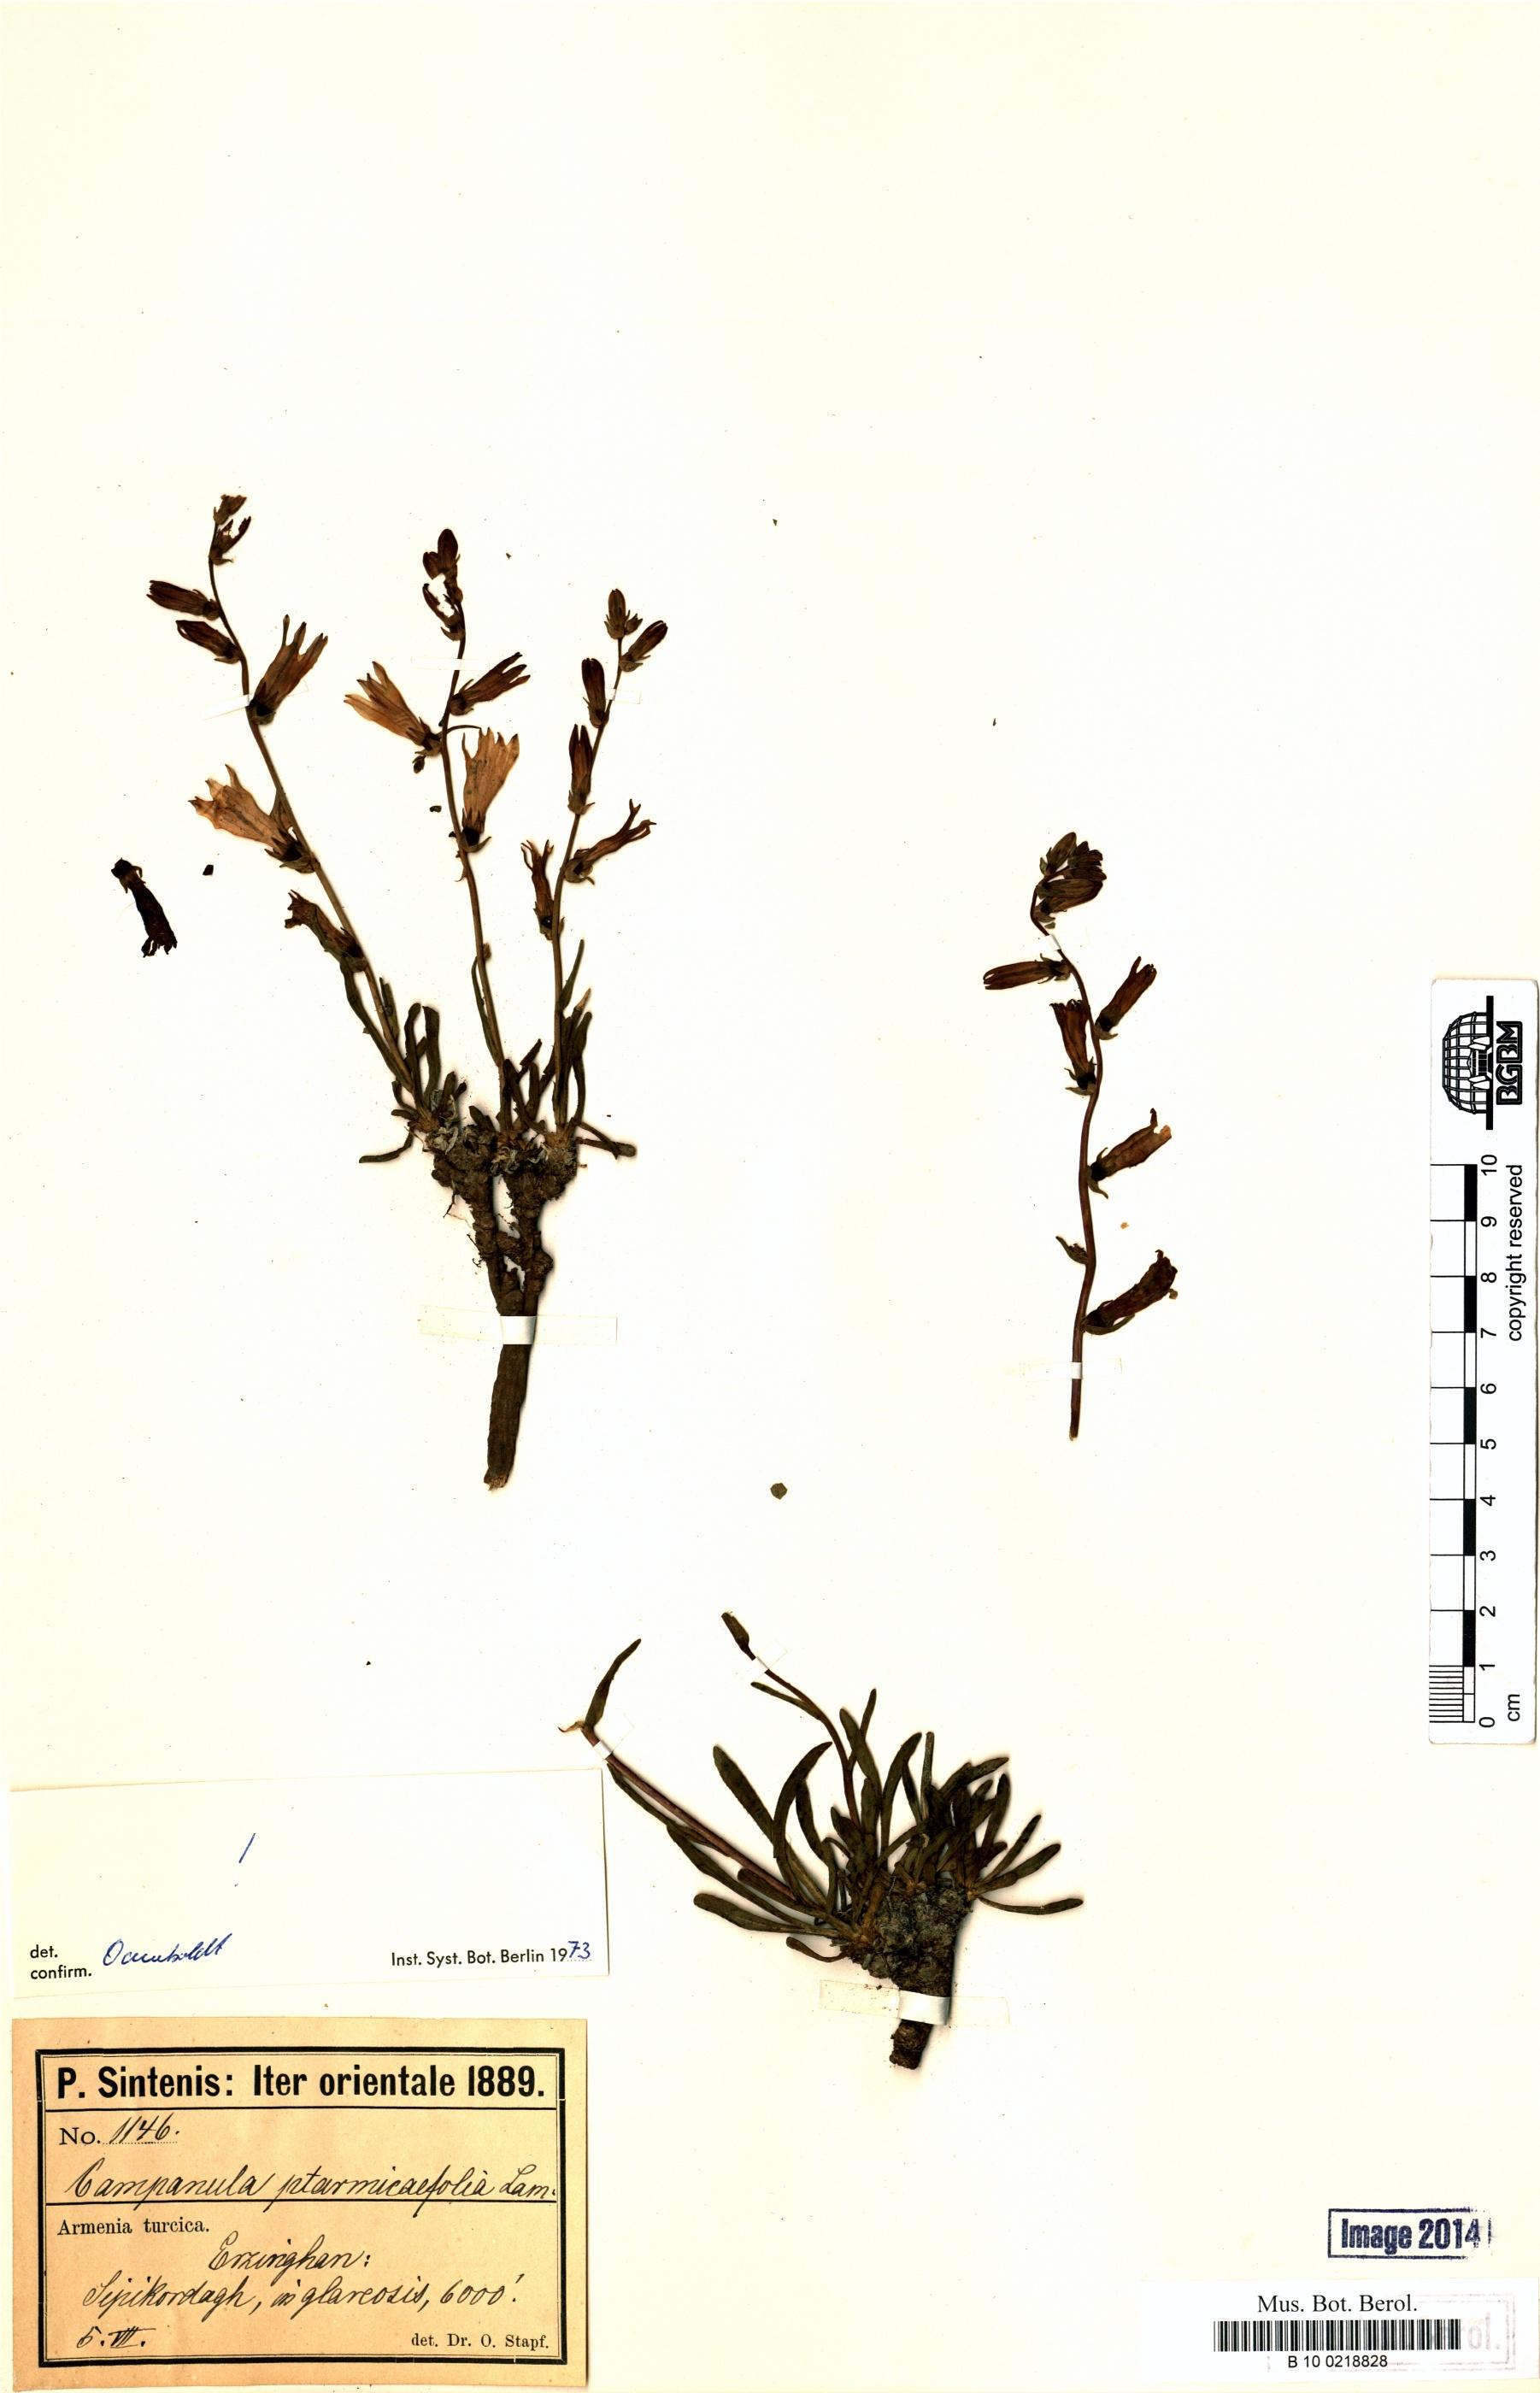 http://ww2.bgbm.org/herbarium/images/B/10/02/18/82/B_10_0218828.jpg